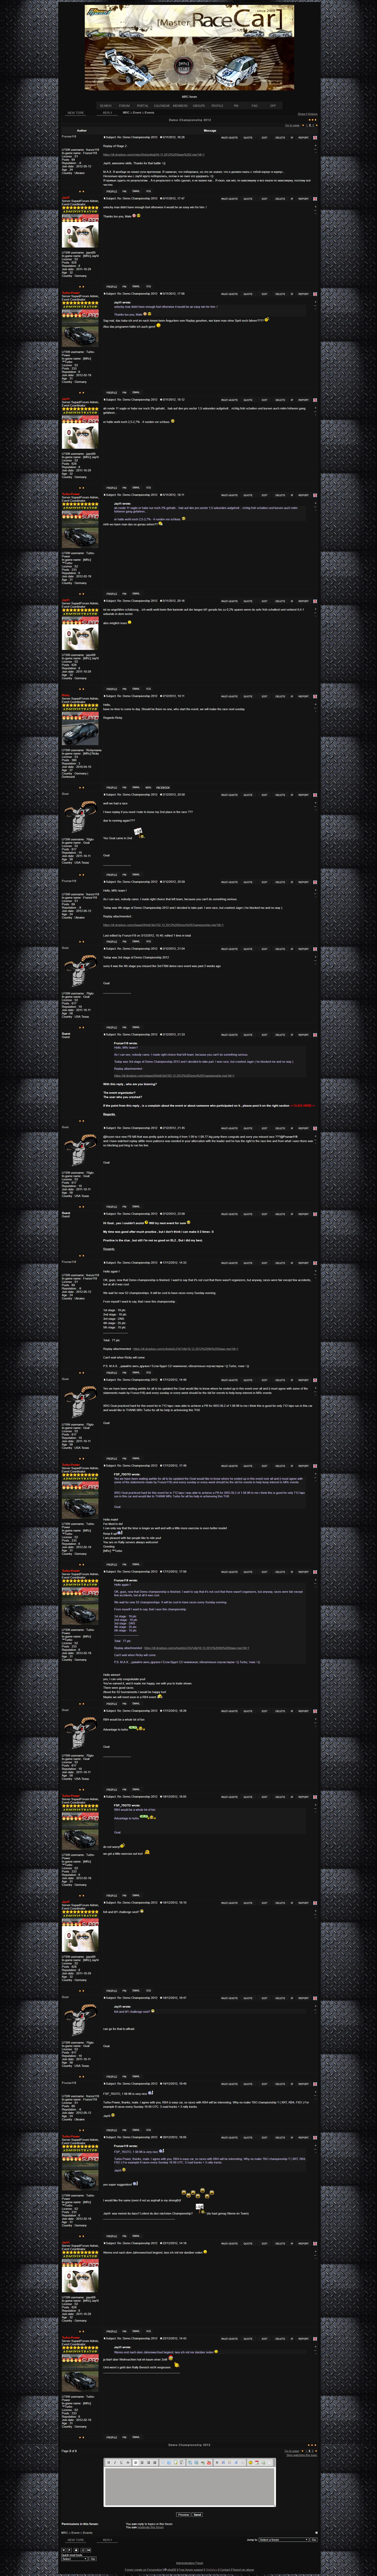 [Image: screencapture-masterracecar-forumactif-t...page-2.jpg]